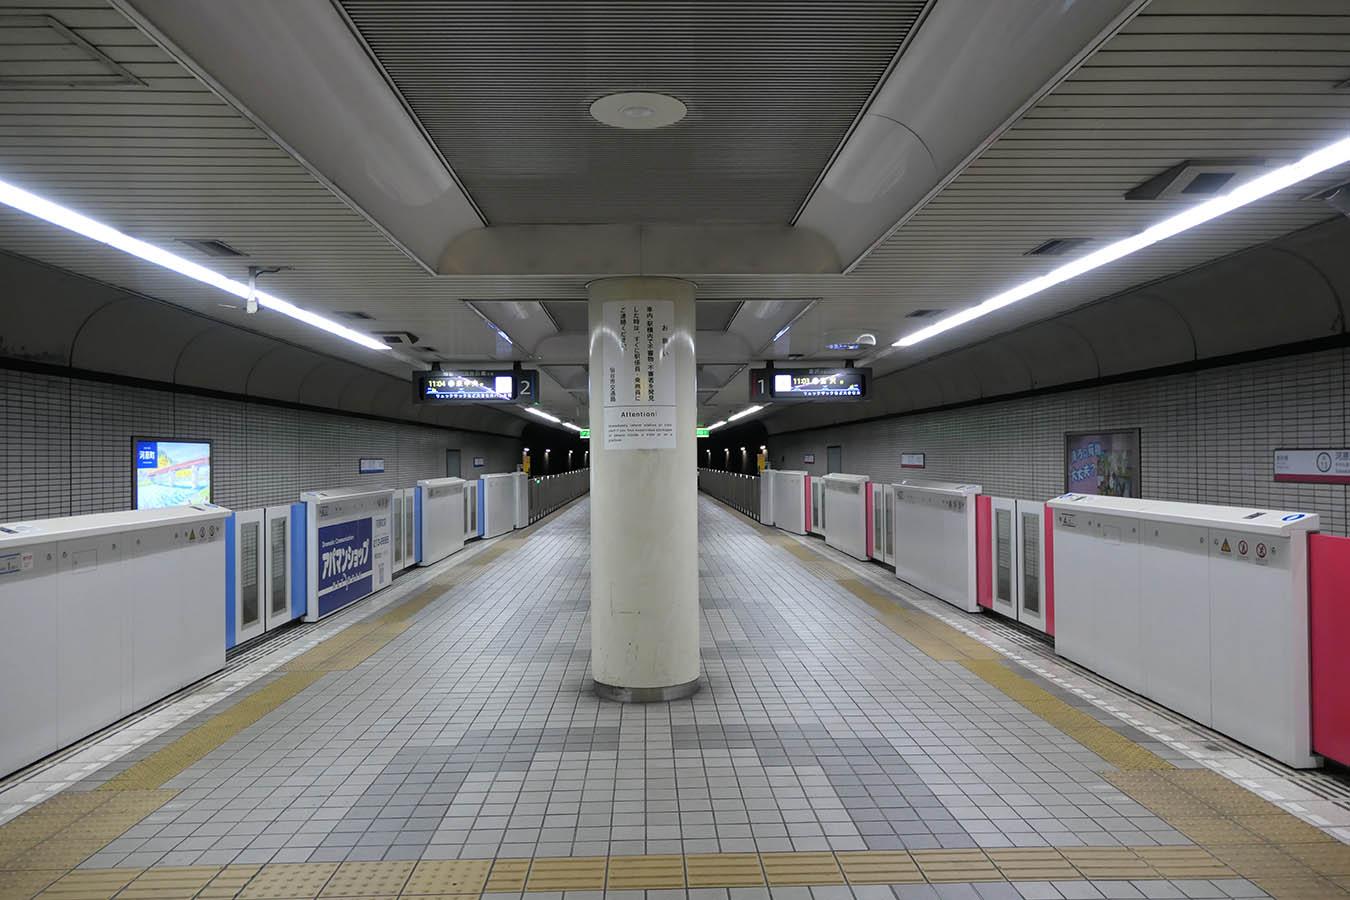 SS-N13_photo04.jpg